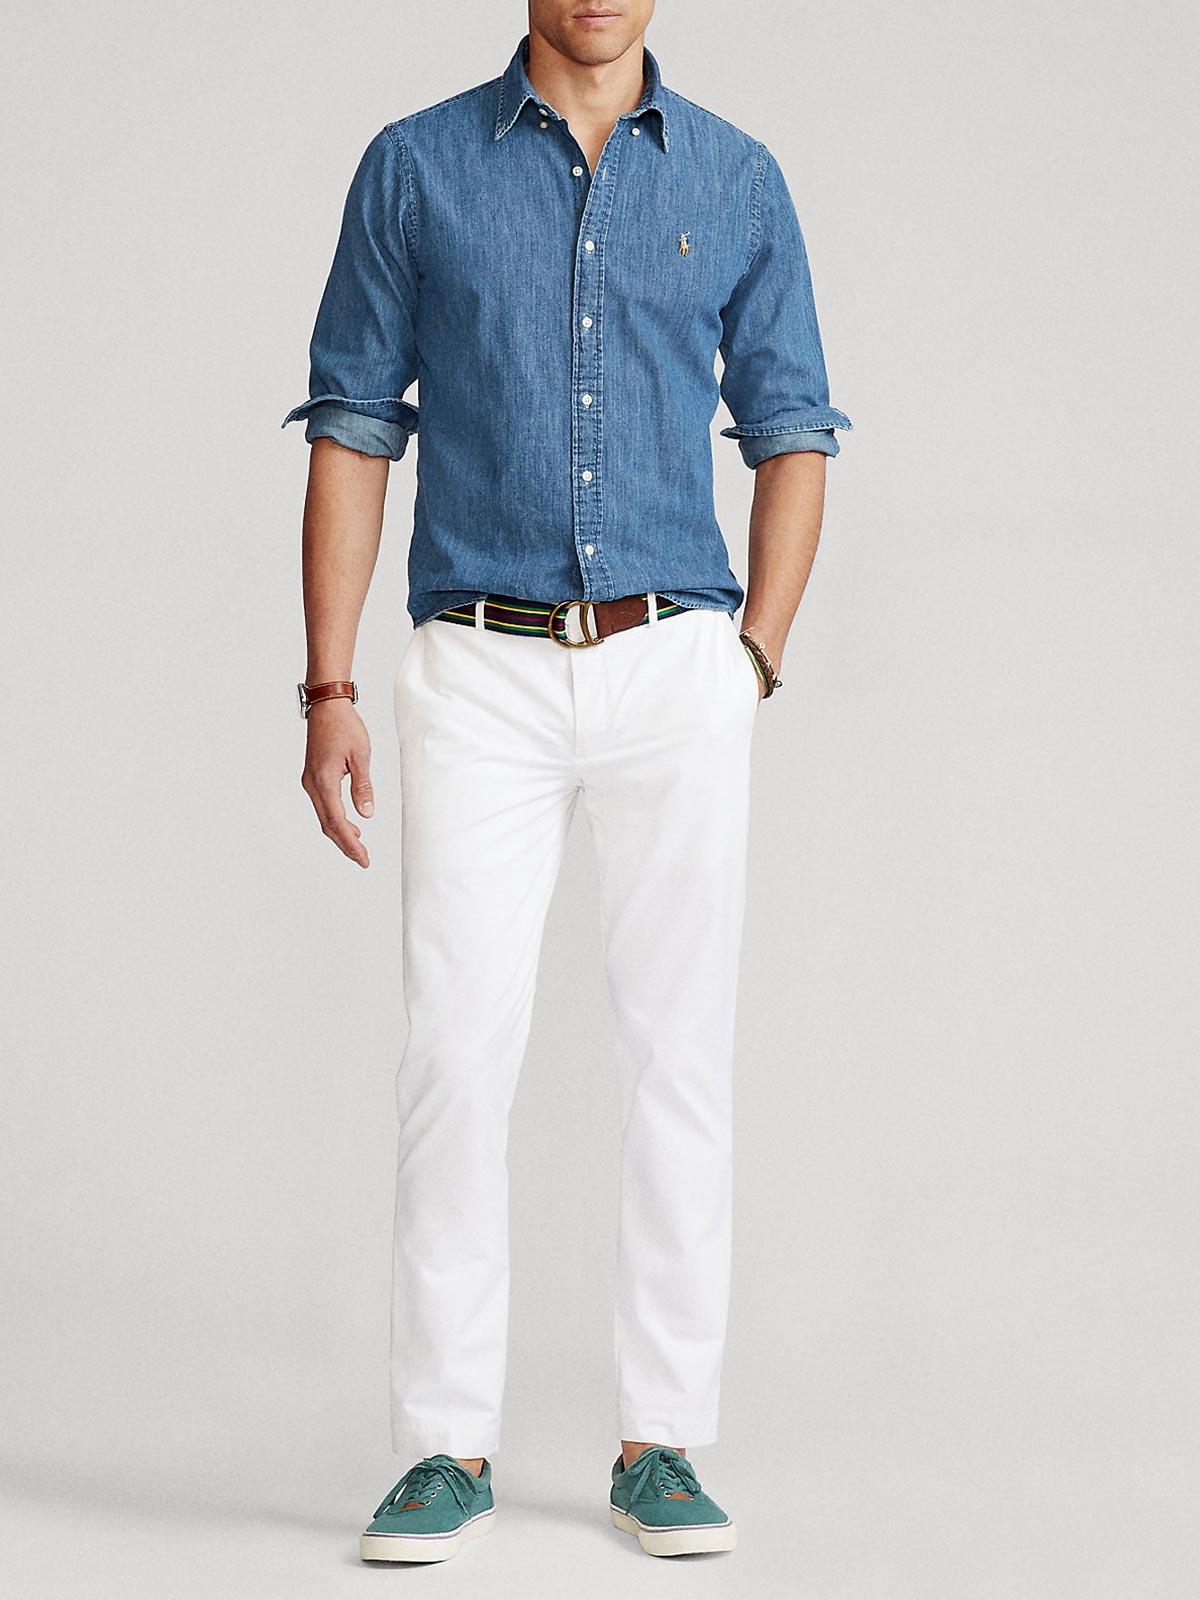 Picture of POLO RALPH LAUREN | Men's Denim Custom Fit Shirt